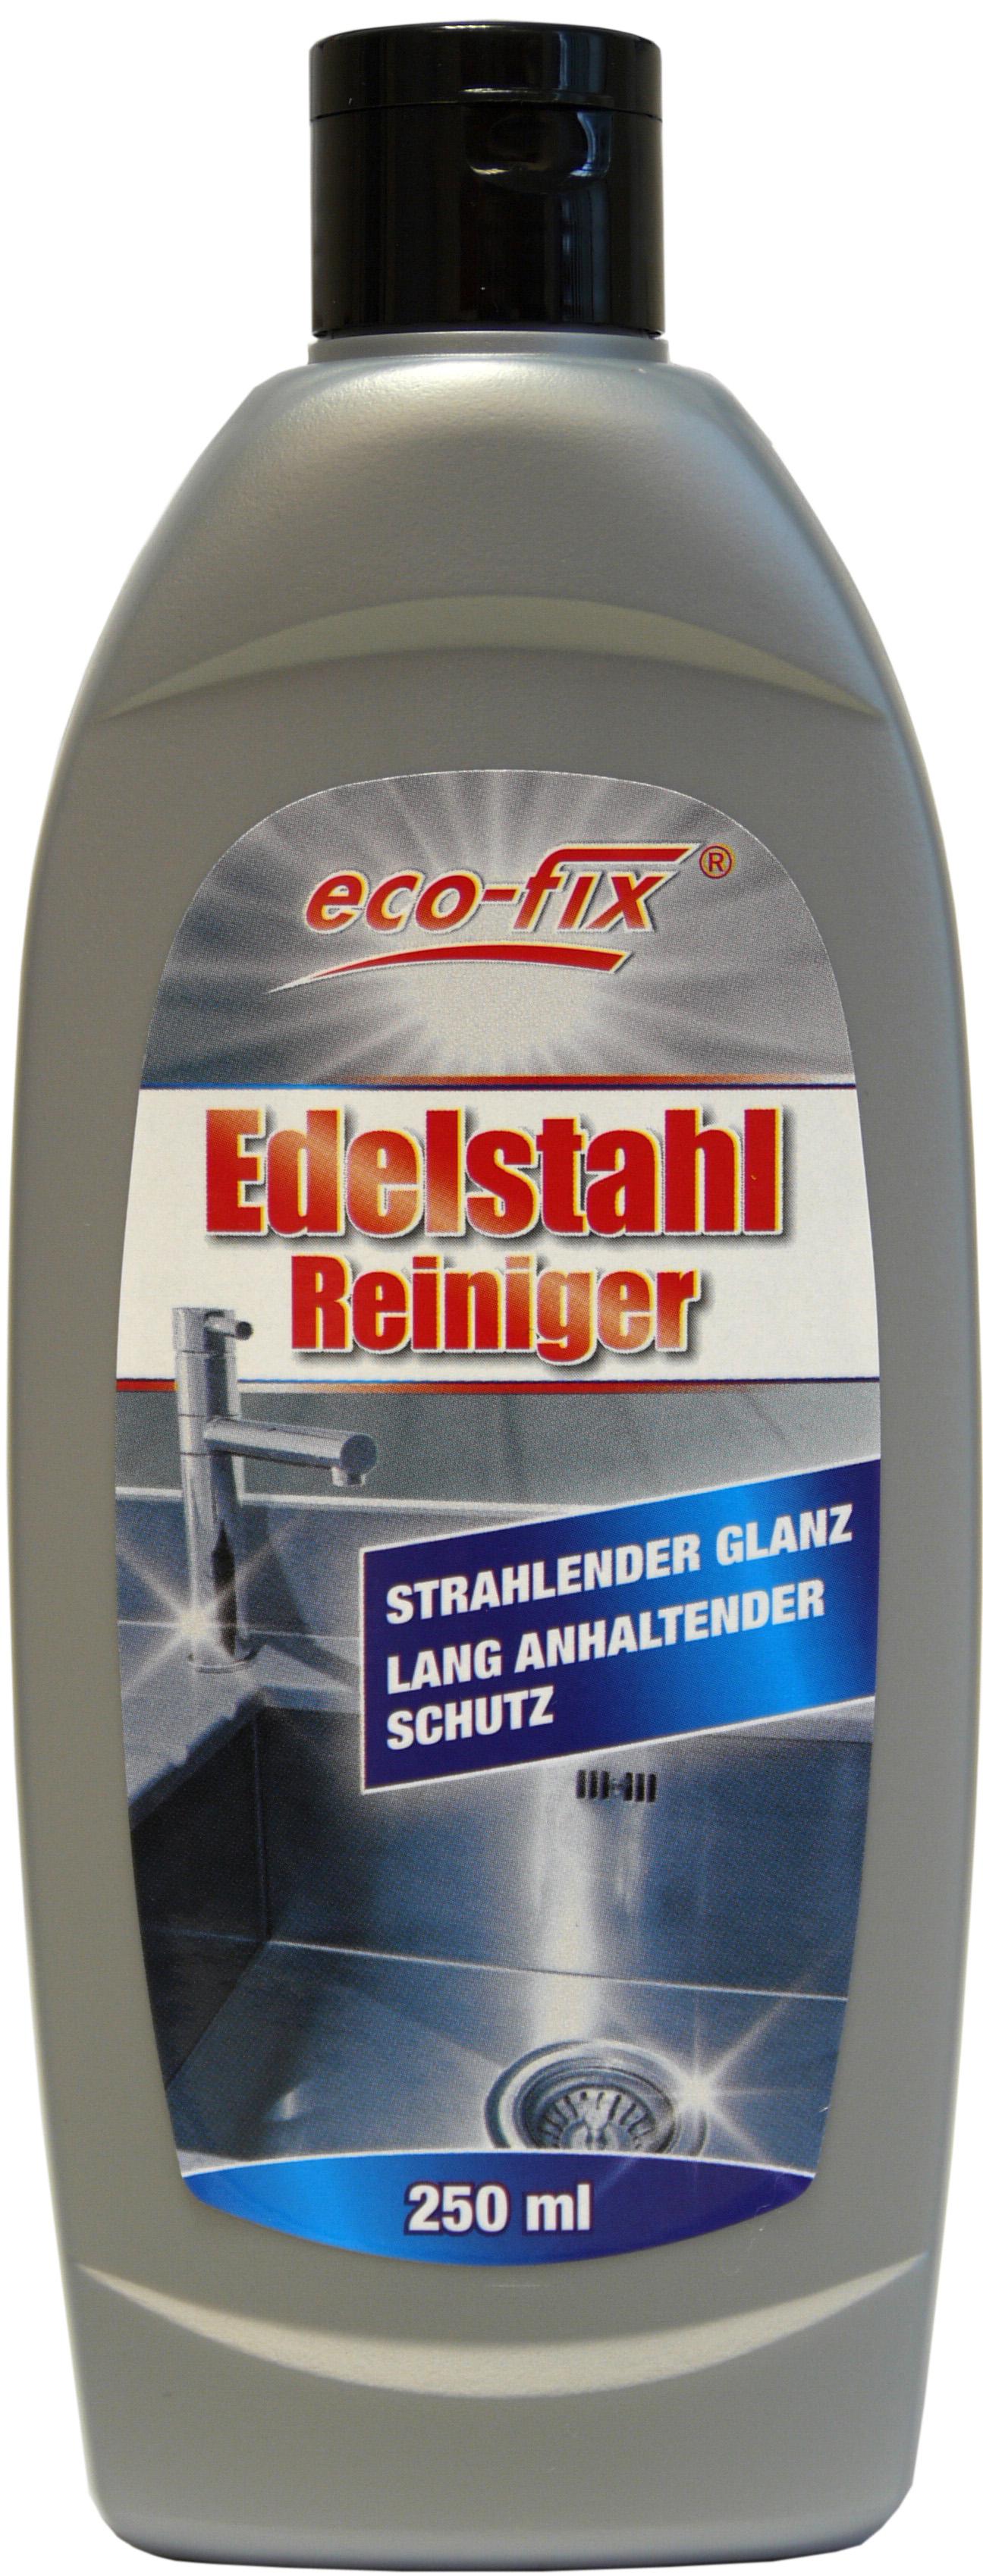 02460 - eco-fix Edelstahlreiniger 250 ml